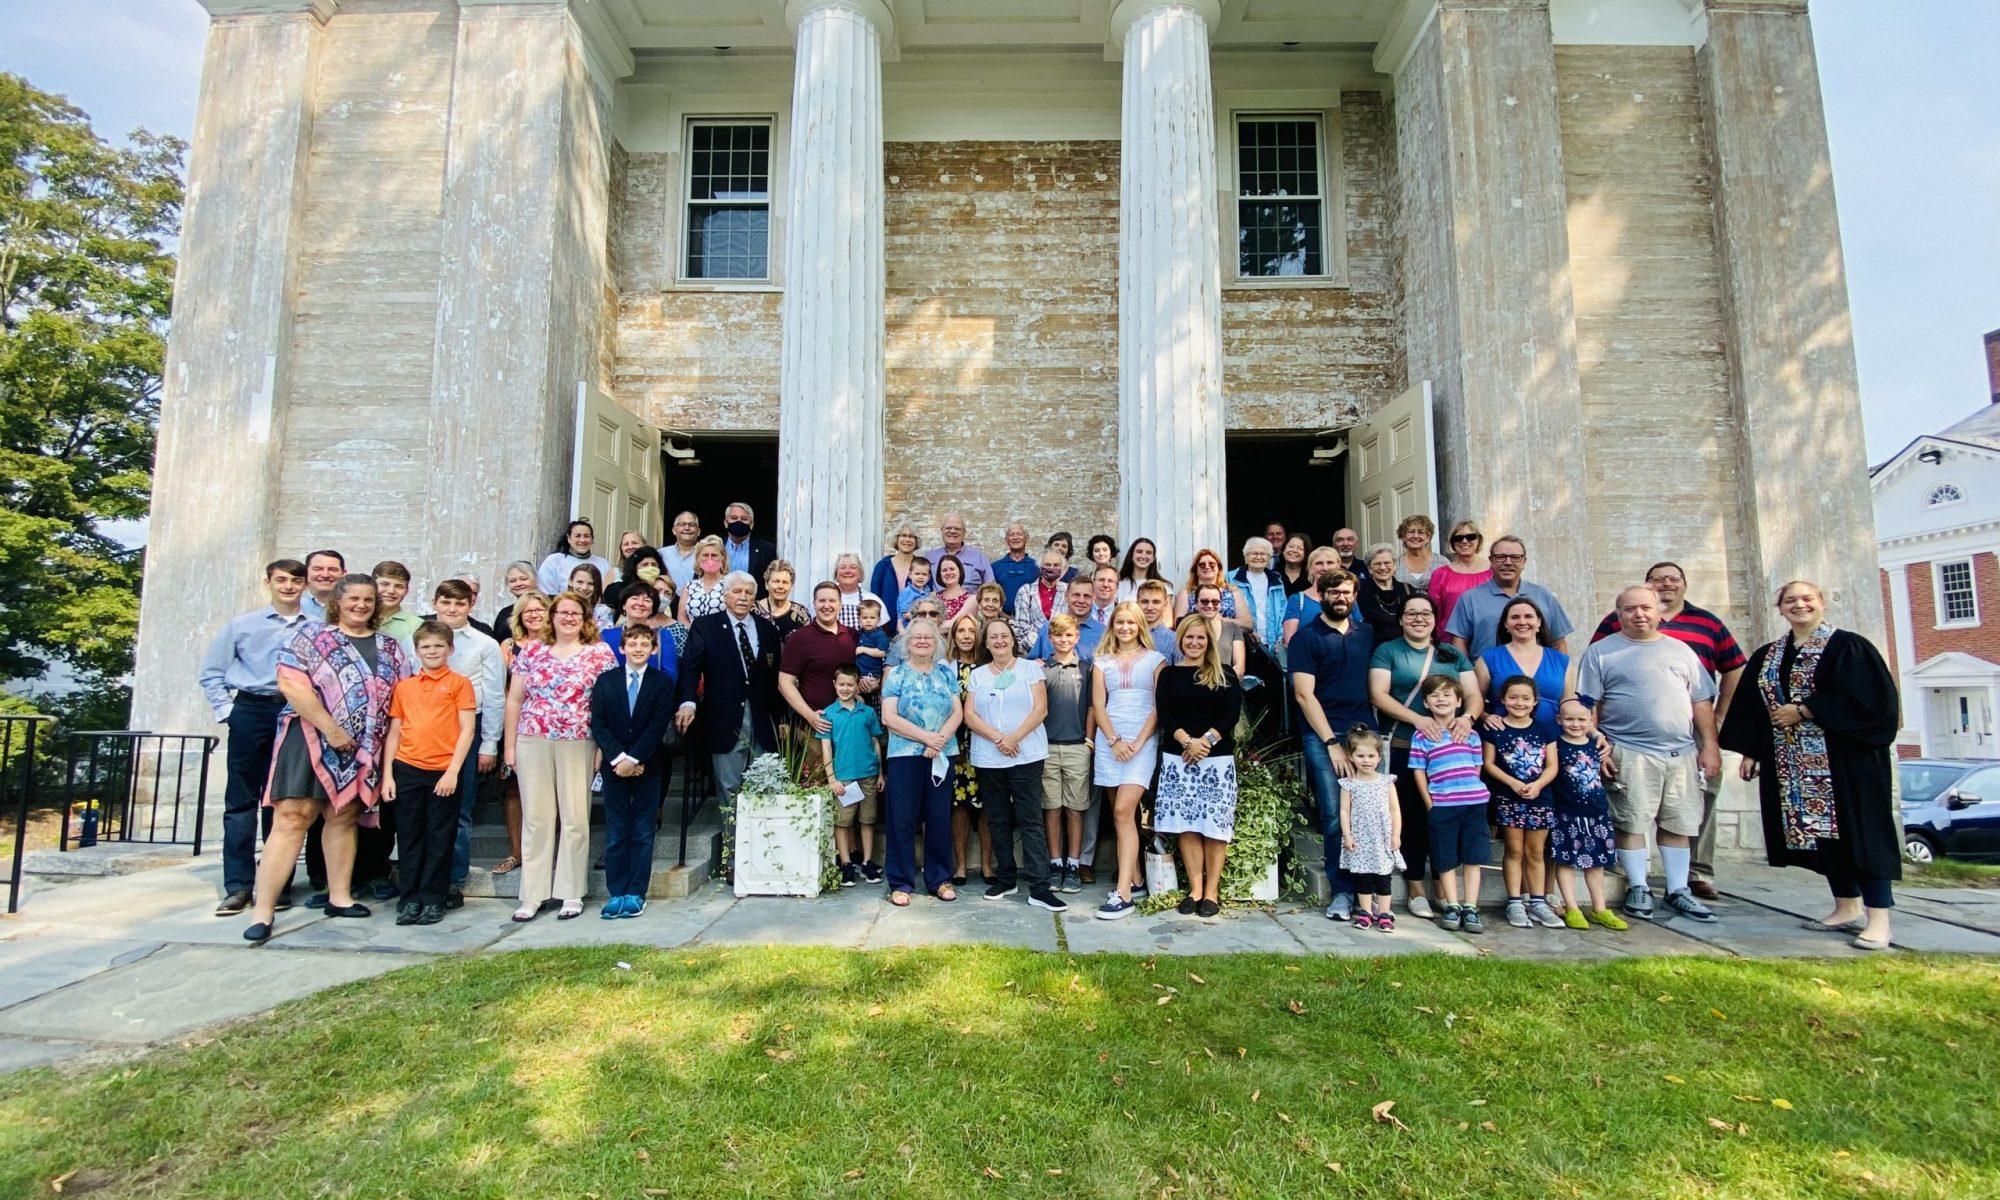 Middlebury Congregational Church